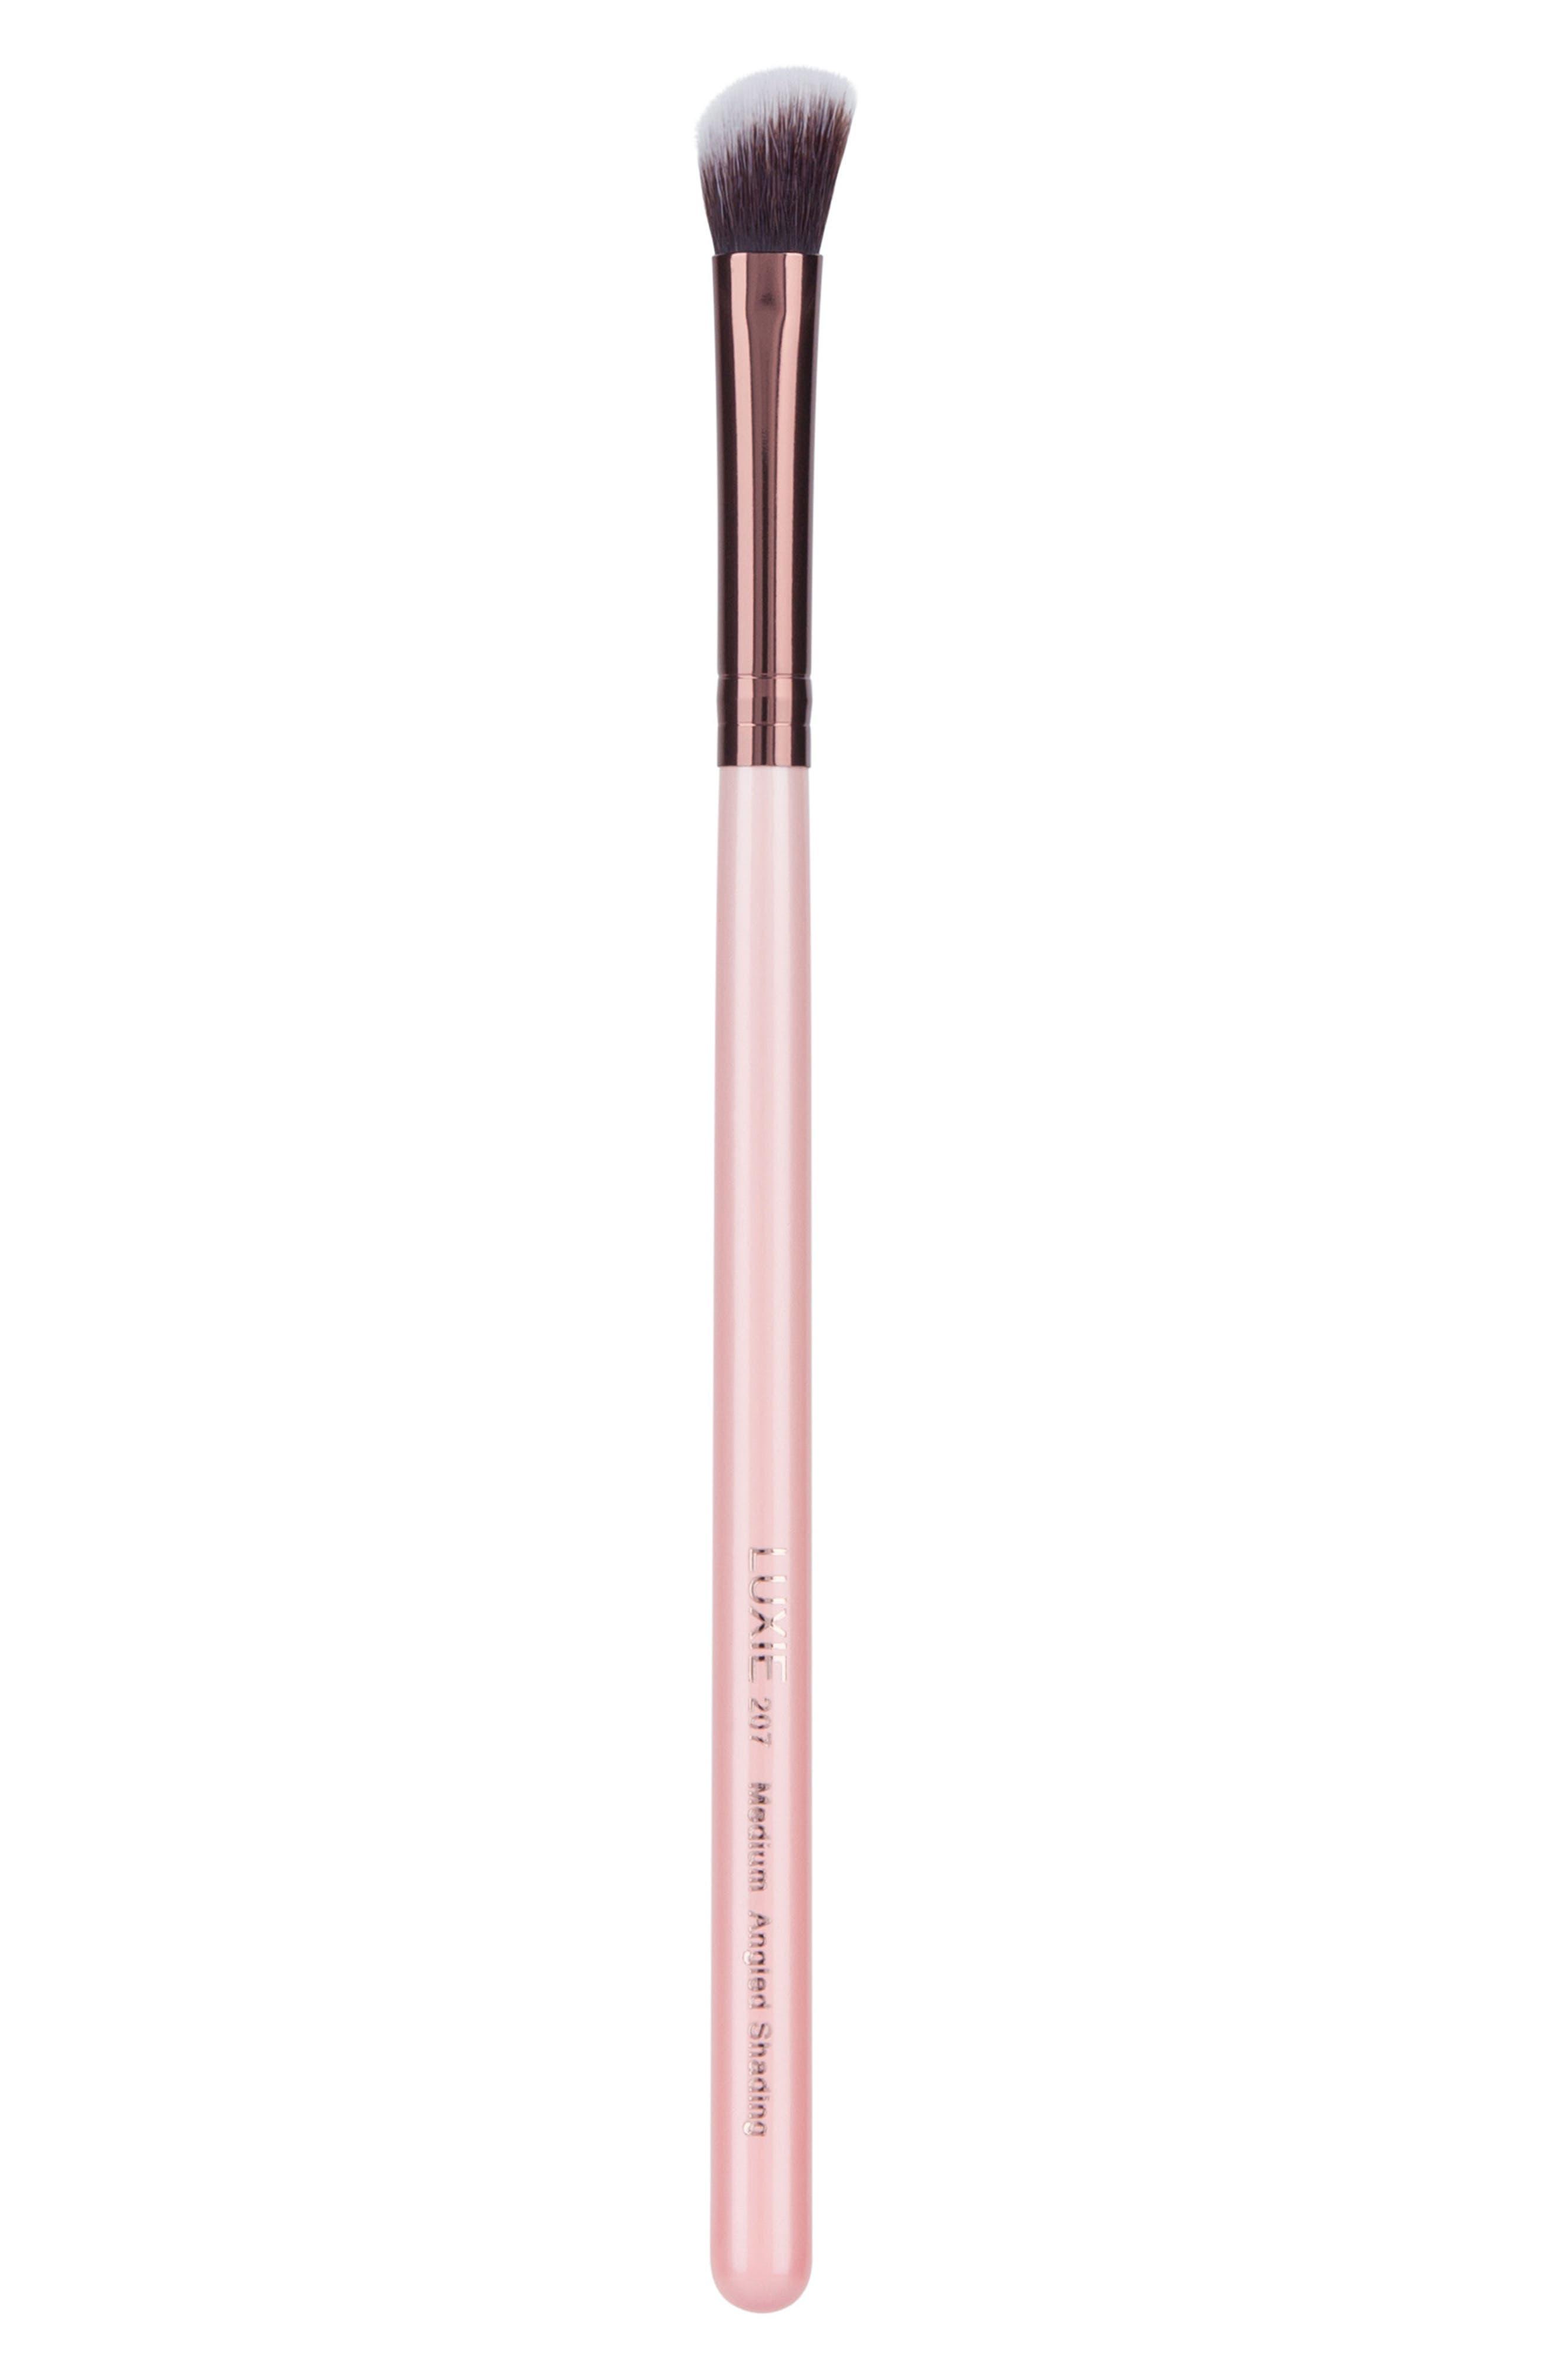 207 Rose Gold Medium Angled Shading Eye Brush,                         Main,                         color, NO COLOR